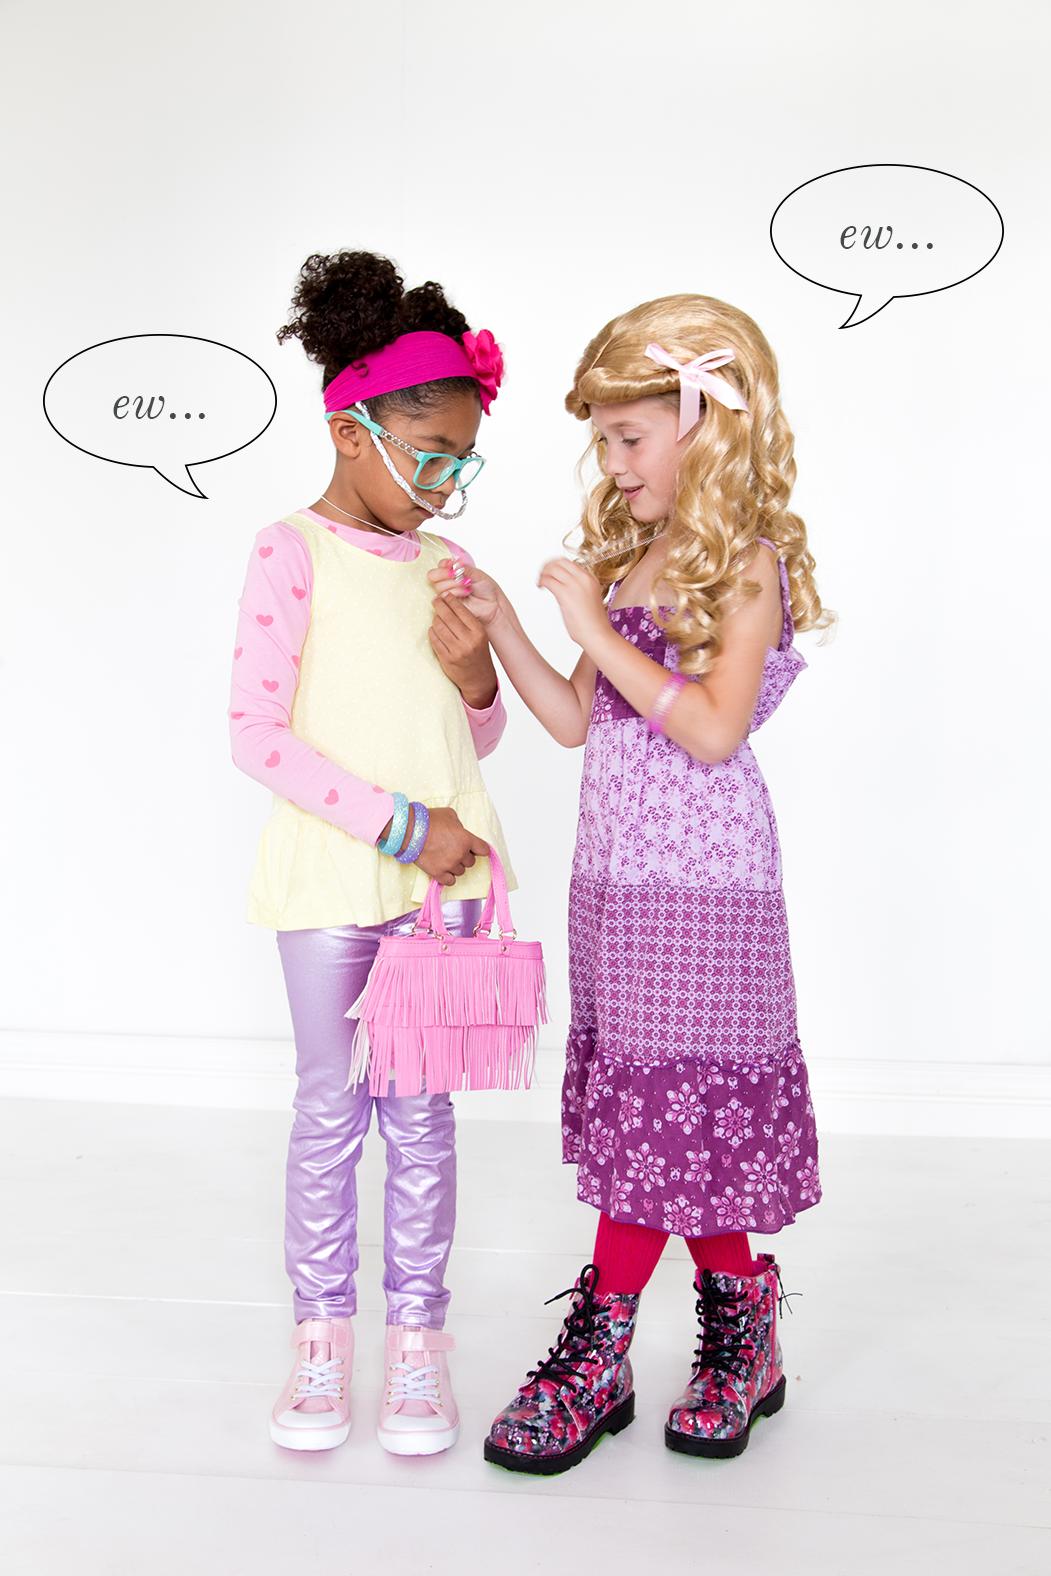 35 Best Friend Halloween Costumes 2019 - DIY Matching